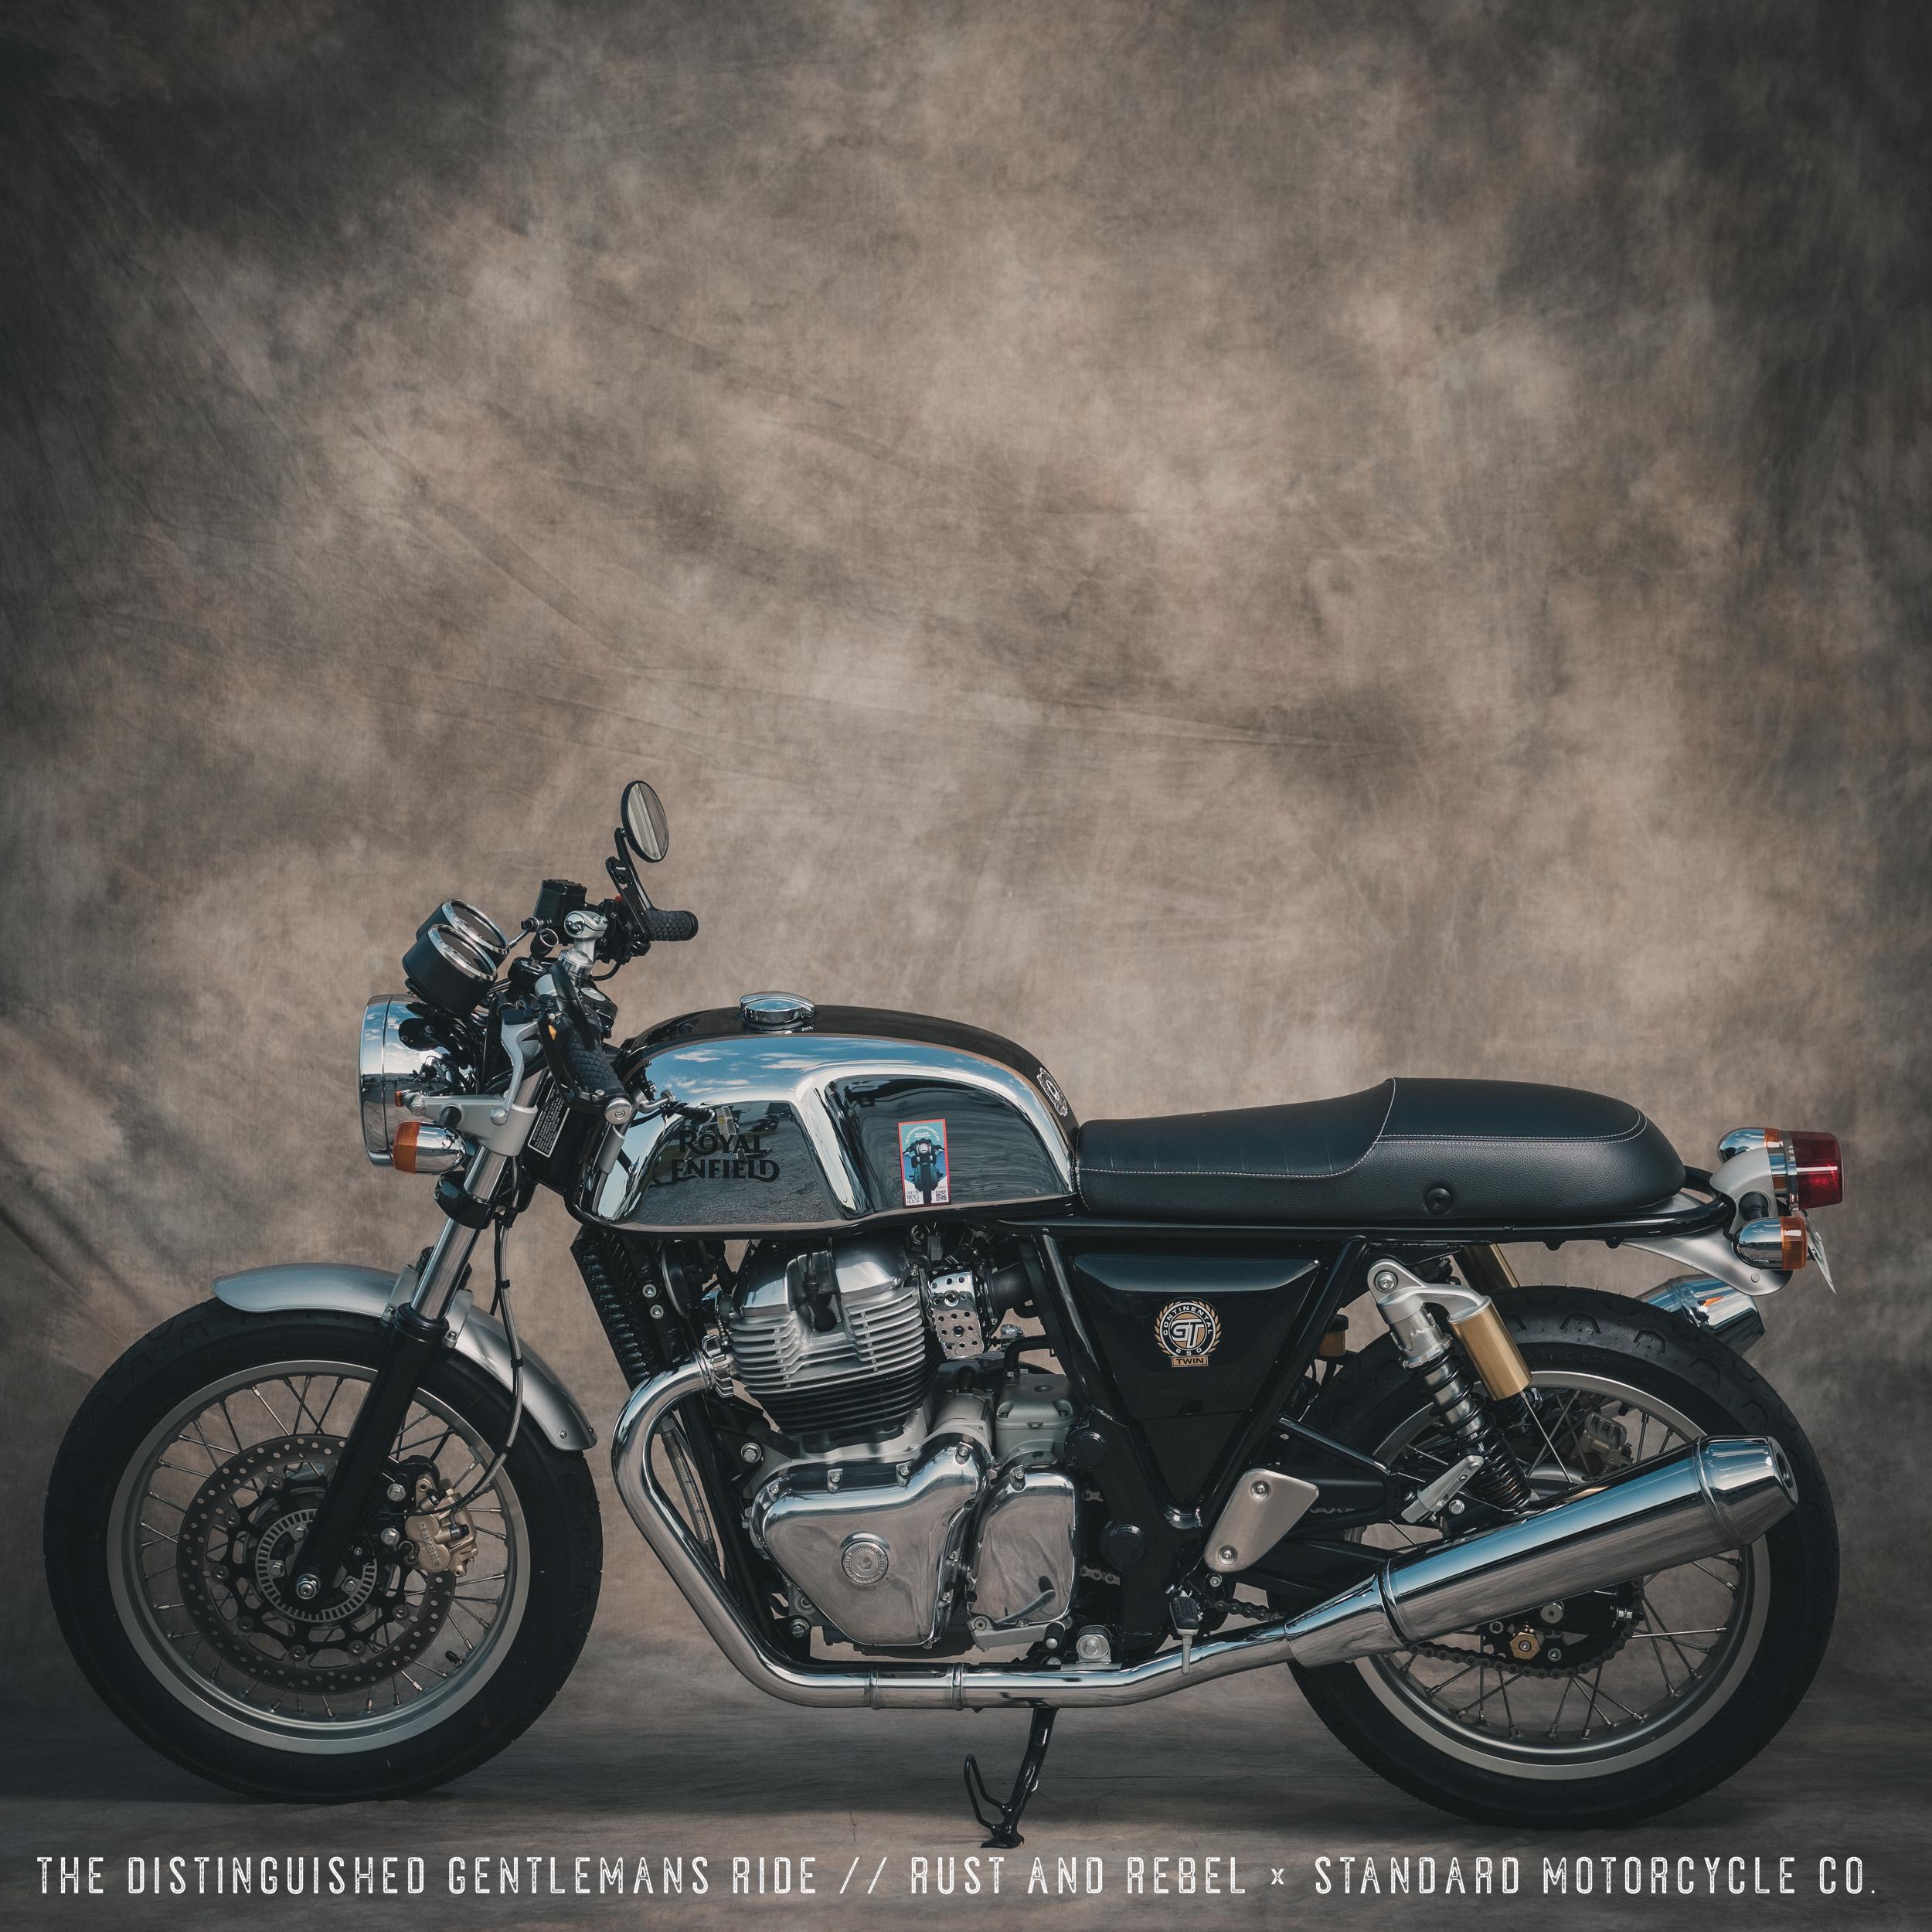 The Distinguished Gentleman's Ride 2019 [BIKES - PHOTO BY @MIKEDUNNUSA] - 0001.jpg